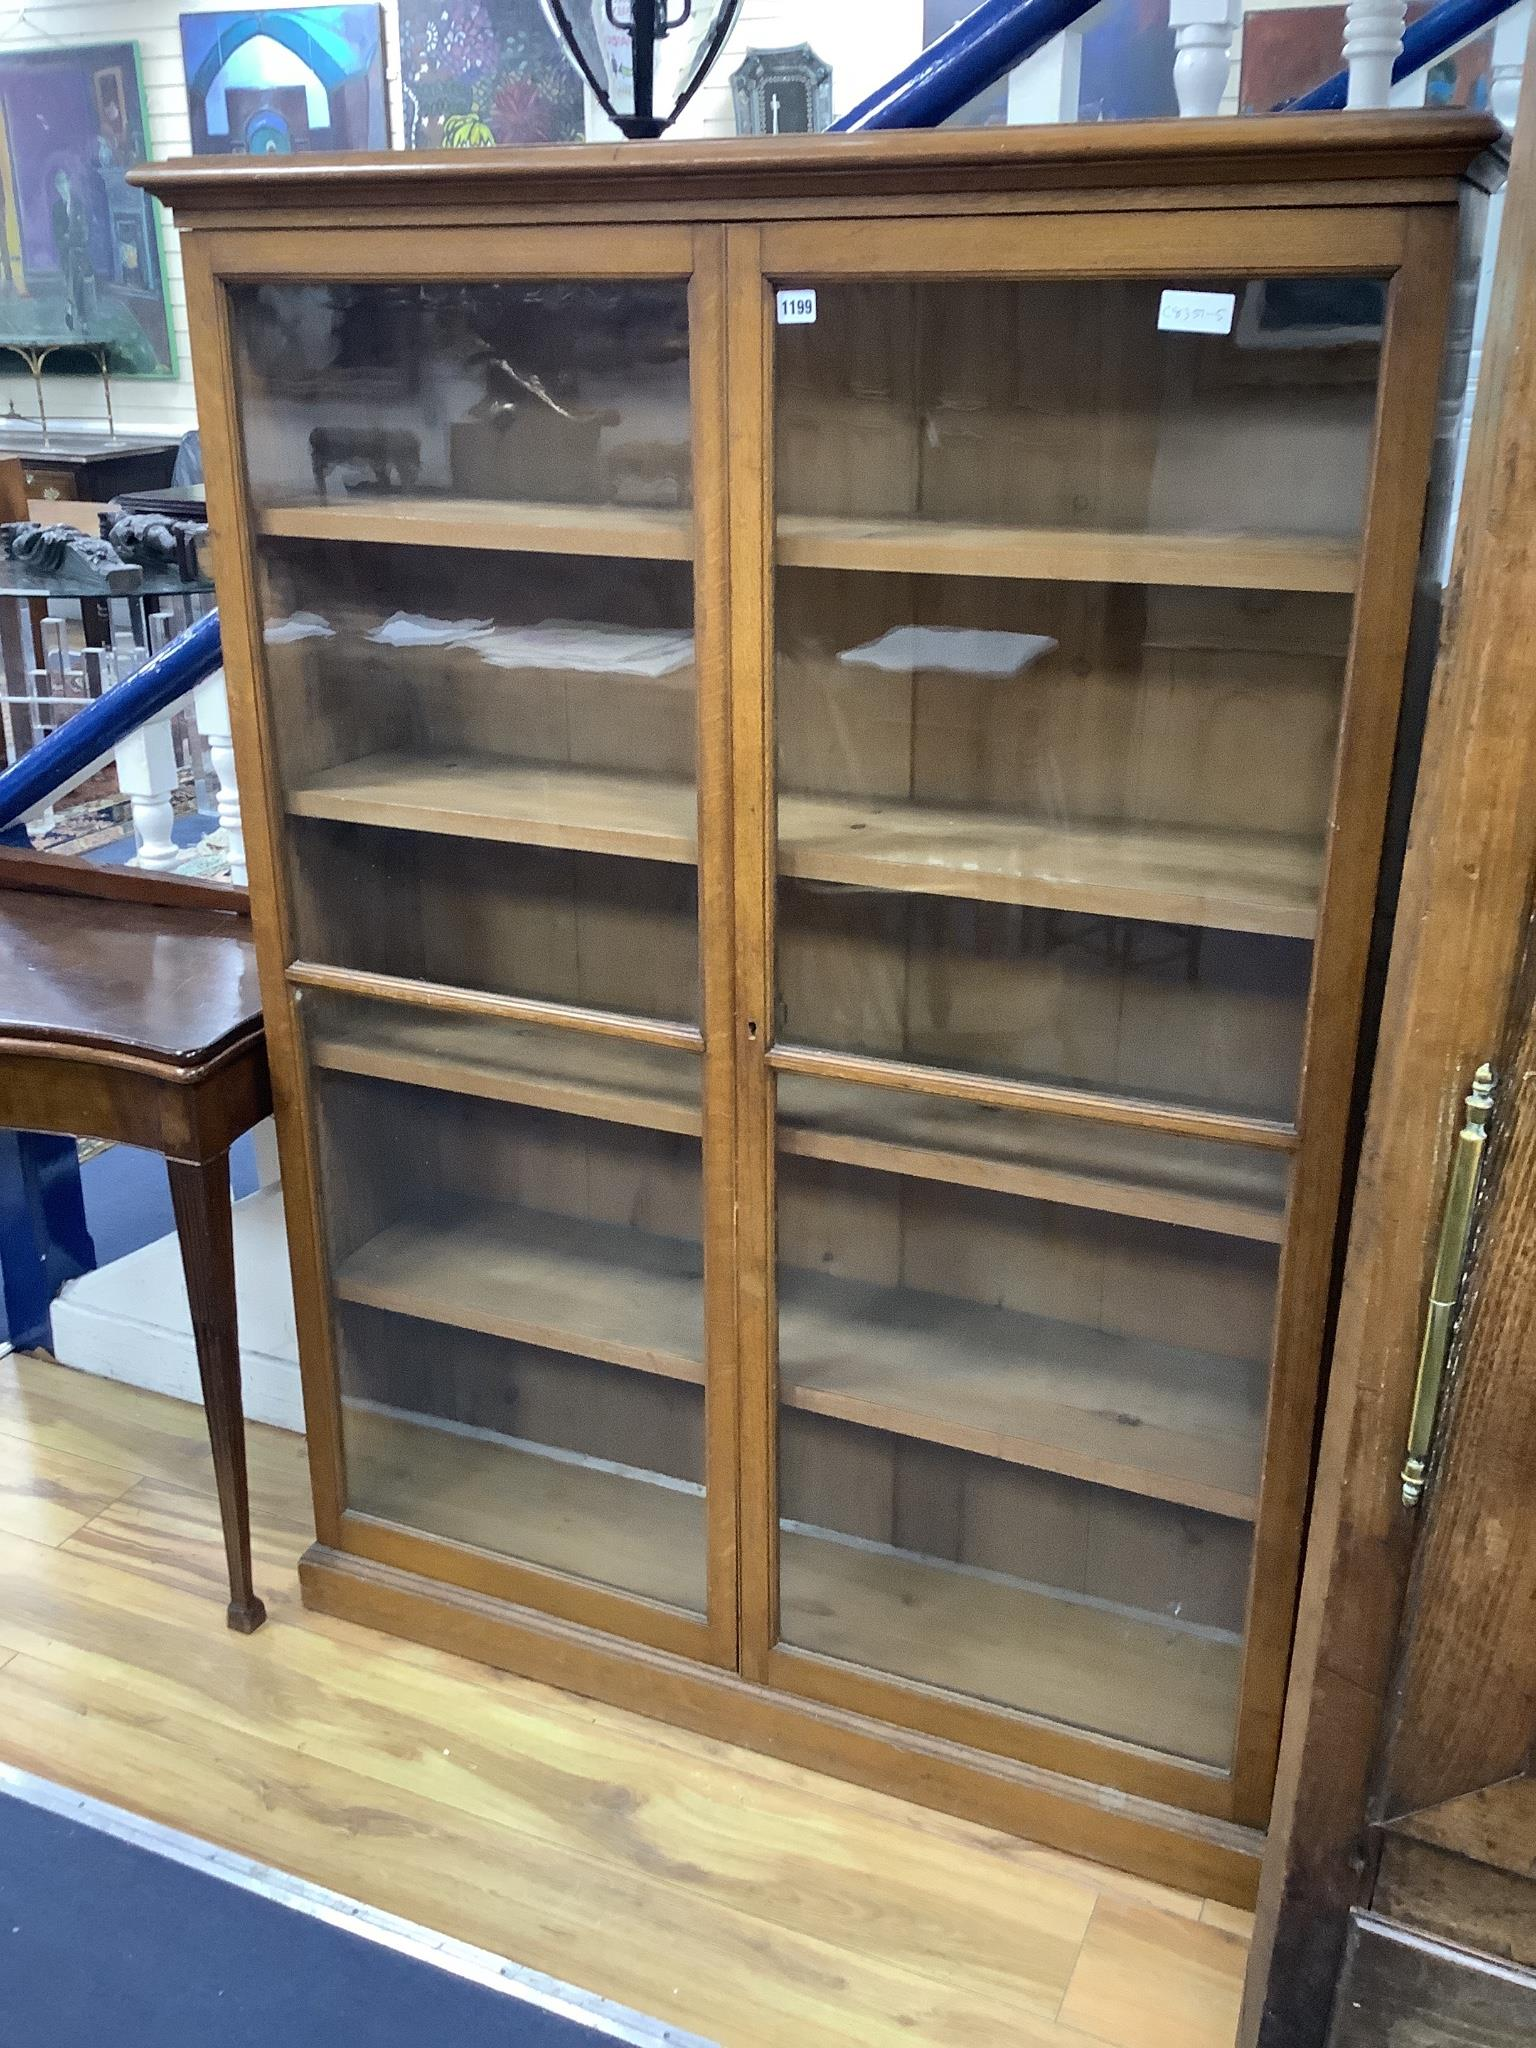 A late Victorian oak two door glazed bookcase, width 112cm, depth 29cm, height 152cm